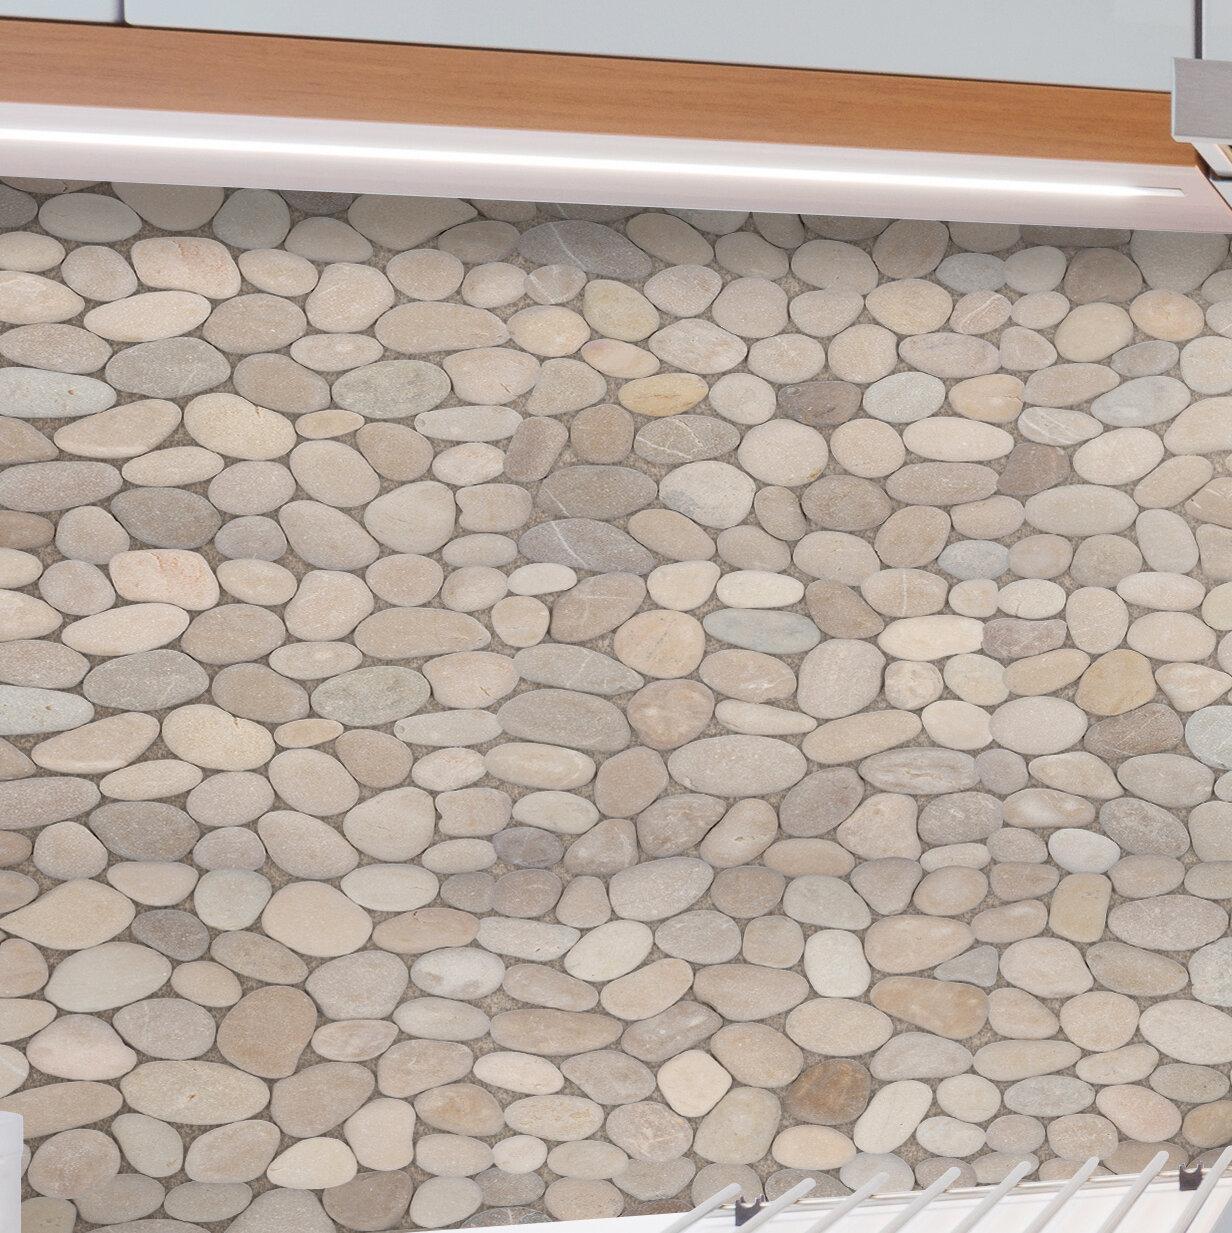 Pebble tile classic pebble random sized natural stone pebble tile in tan reviews wayfair